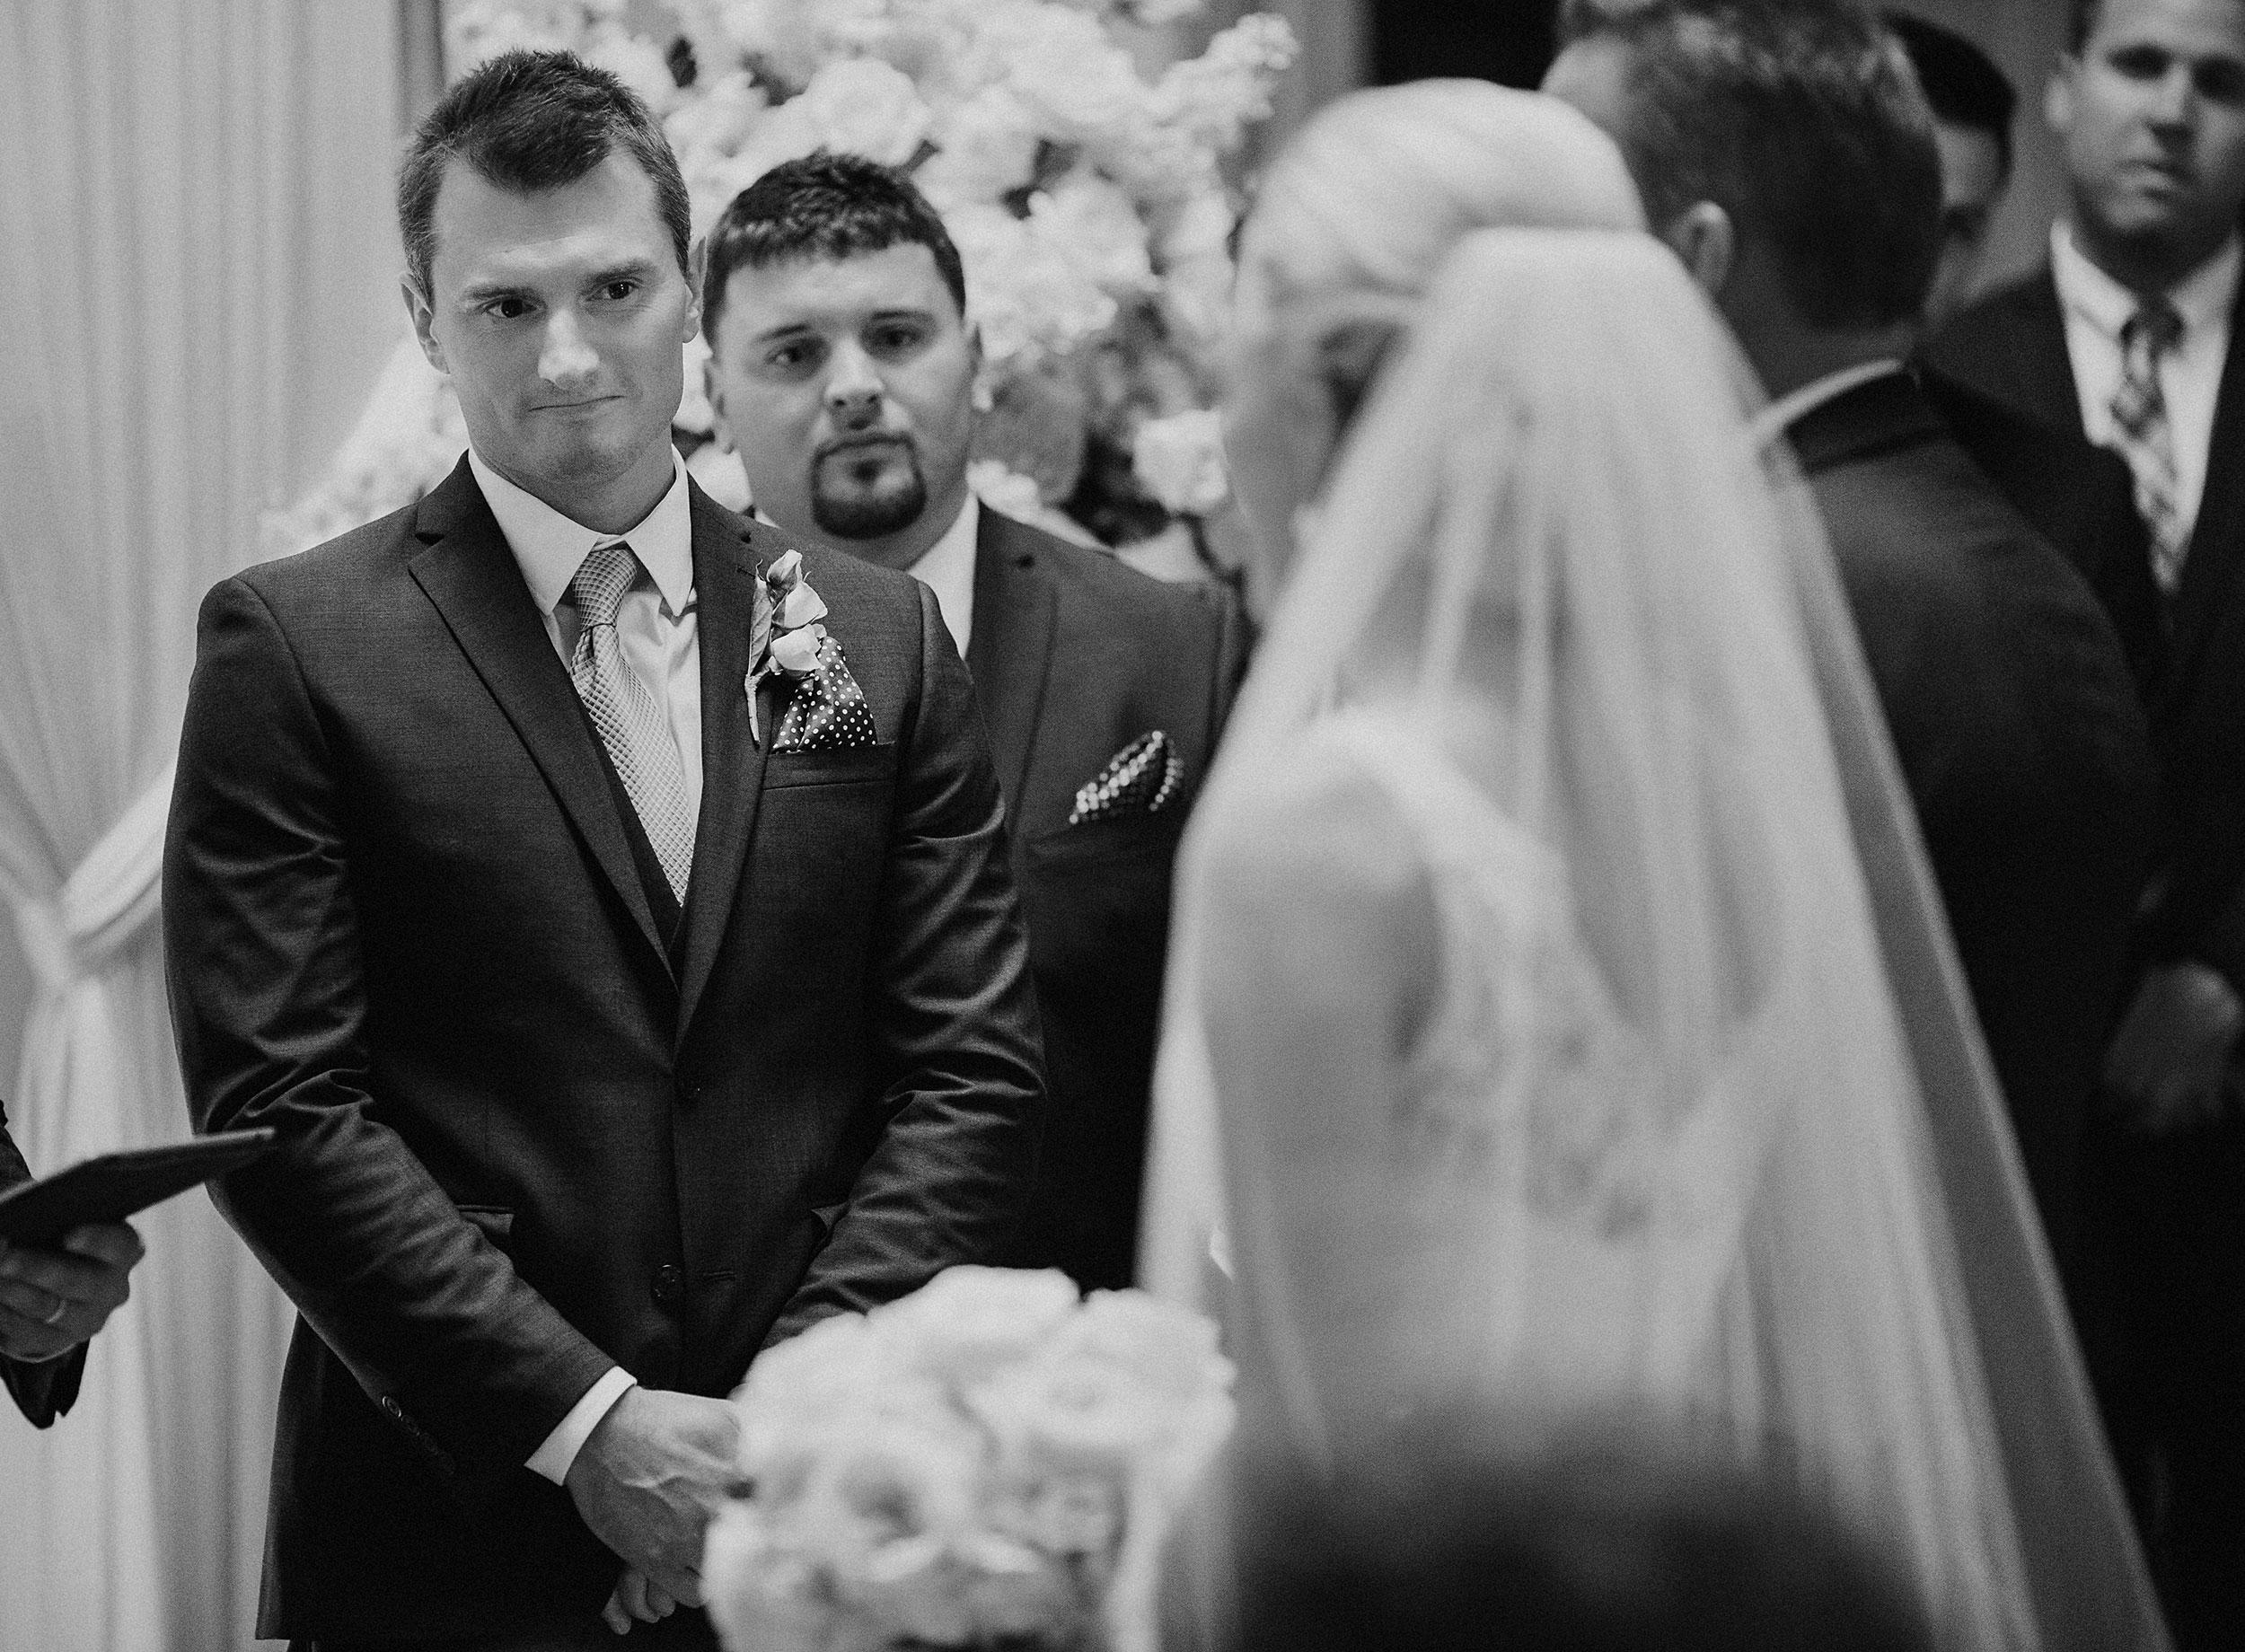 olmsted-wedding-louisville-kentucky-024.JPG